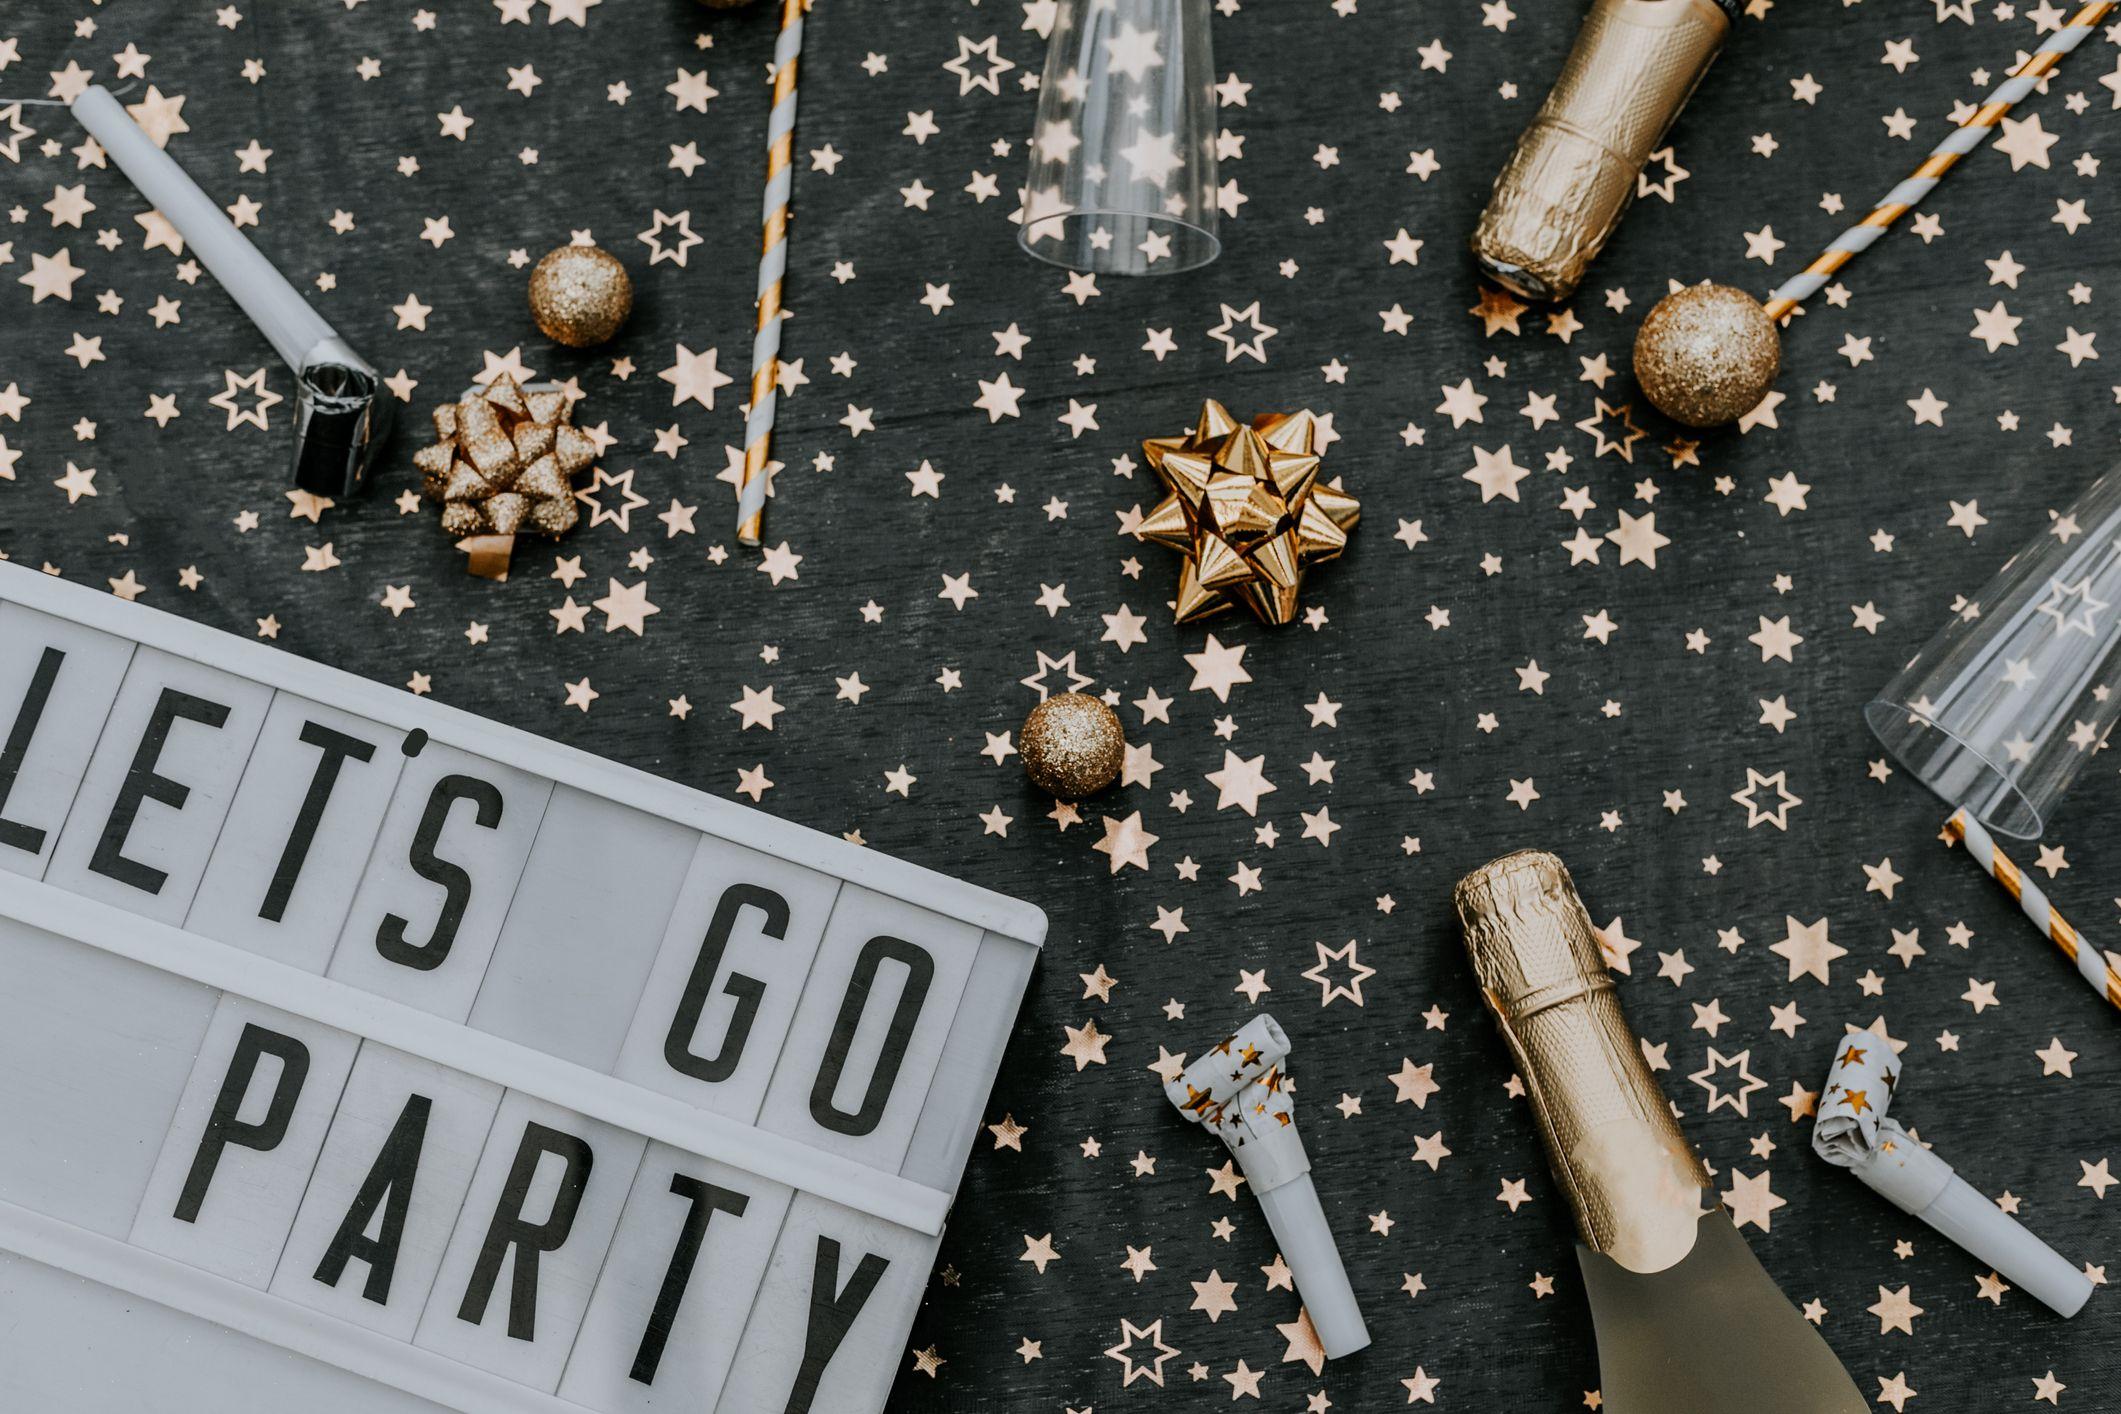 25 Best New Year\u0027s Eve Decorations 2020 \u2014 New Year\u0027s Decor